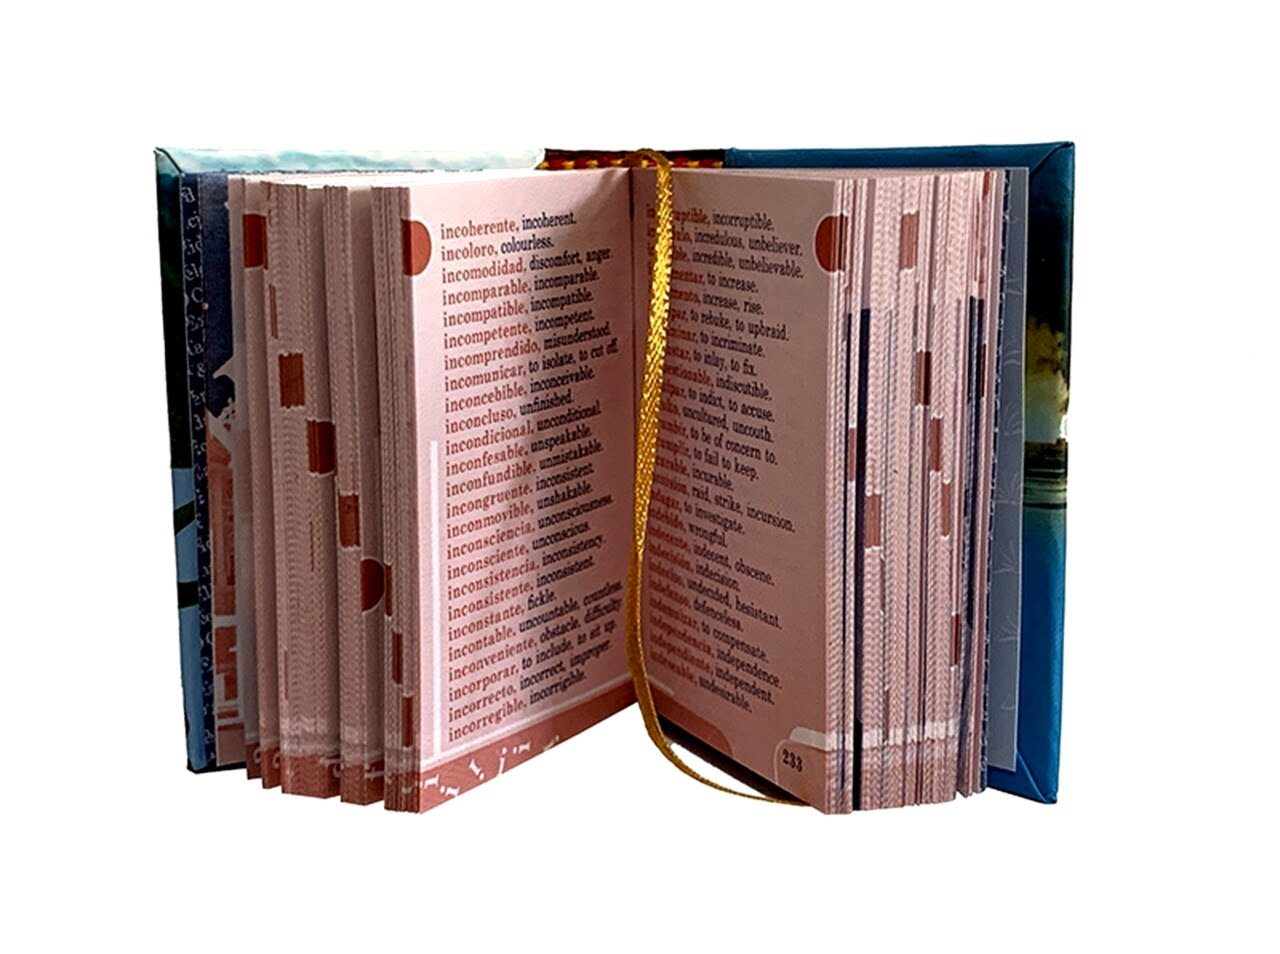 Diccionario-Espanol-Ingles_1-miniature-book-libro